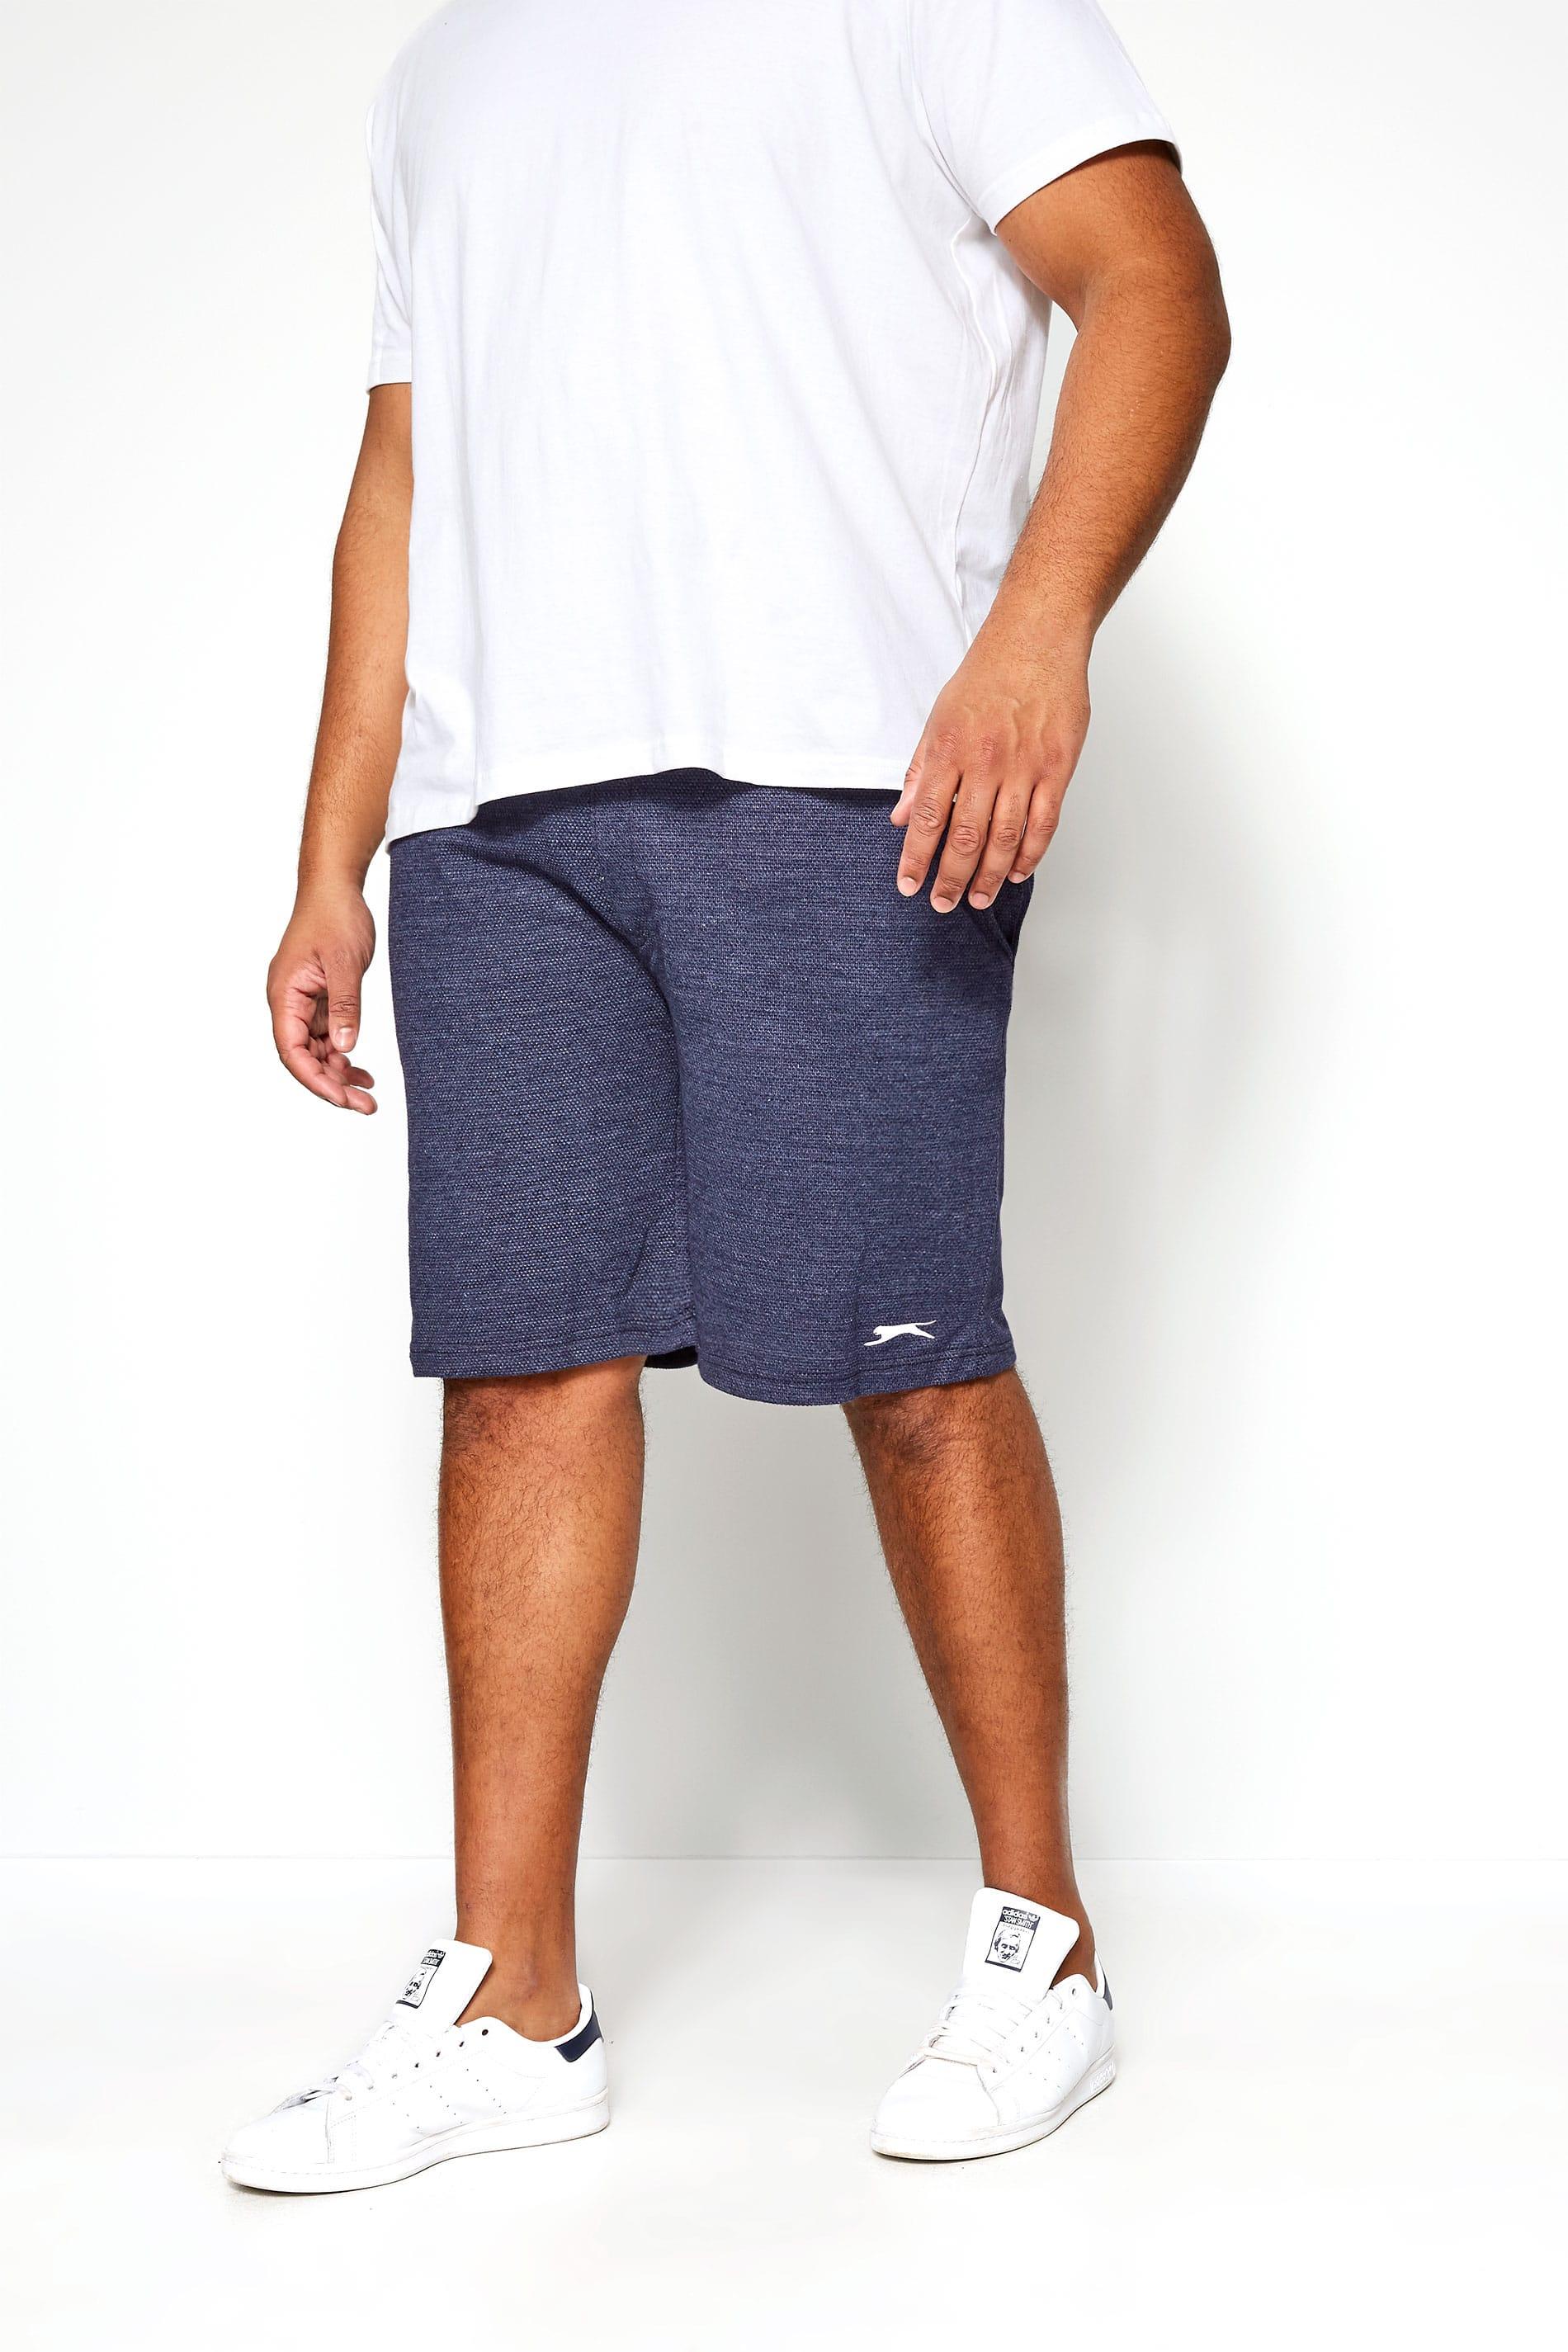 SLAZENGER Navy Textured Jogger Shorts